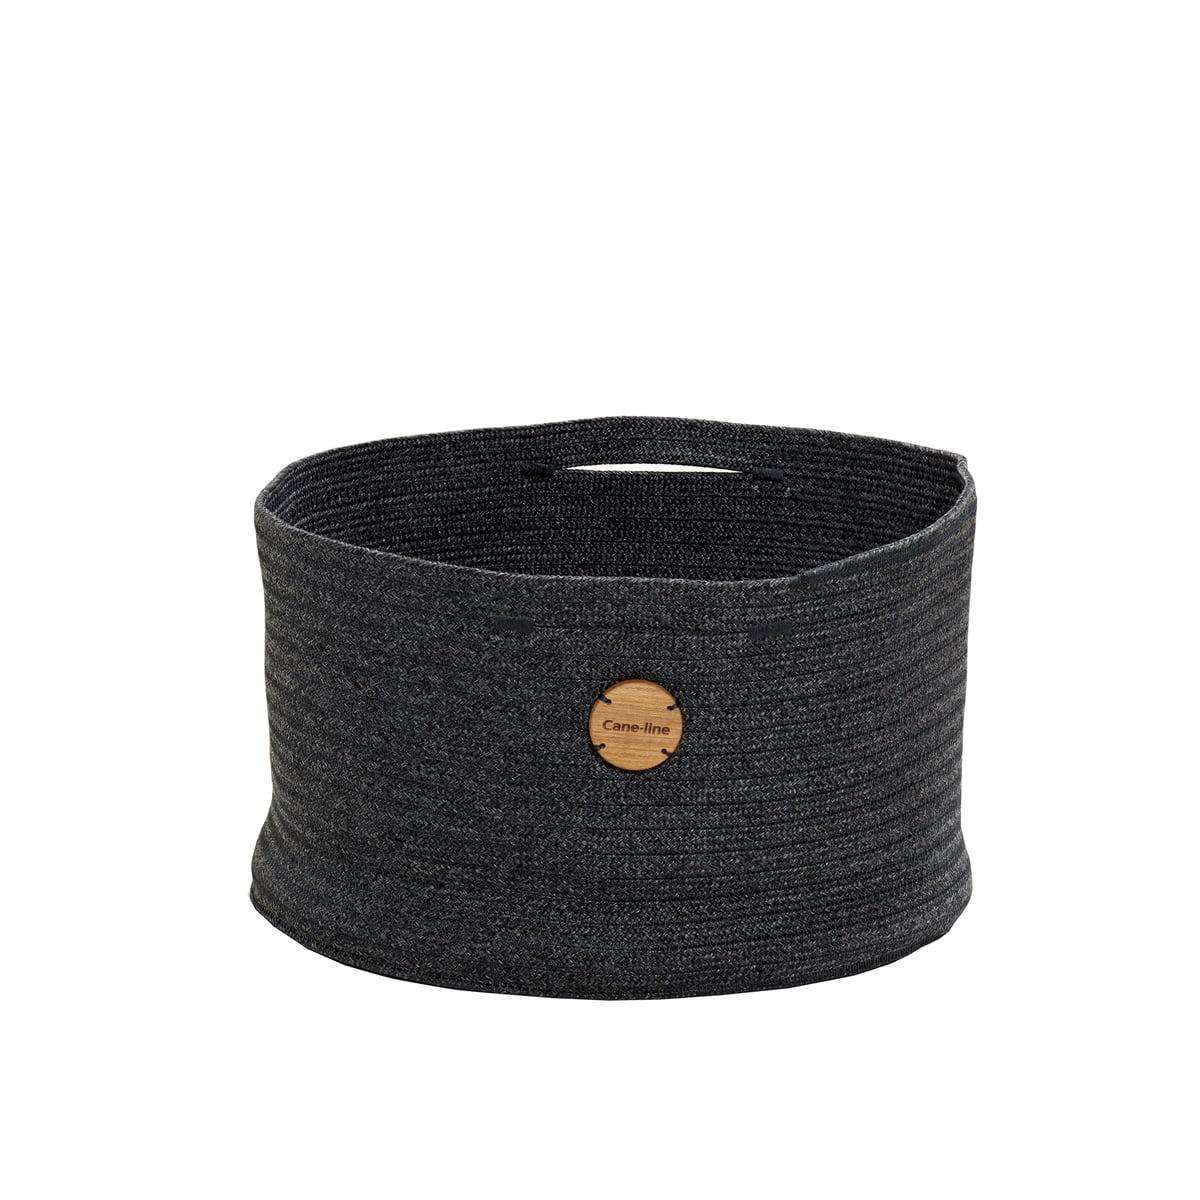 Cane-line - Soft Aufbewahrungskorb Ø 40 cm, dunkelgrau